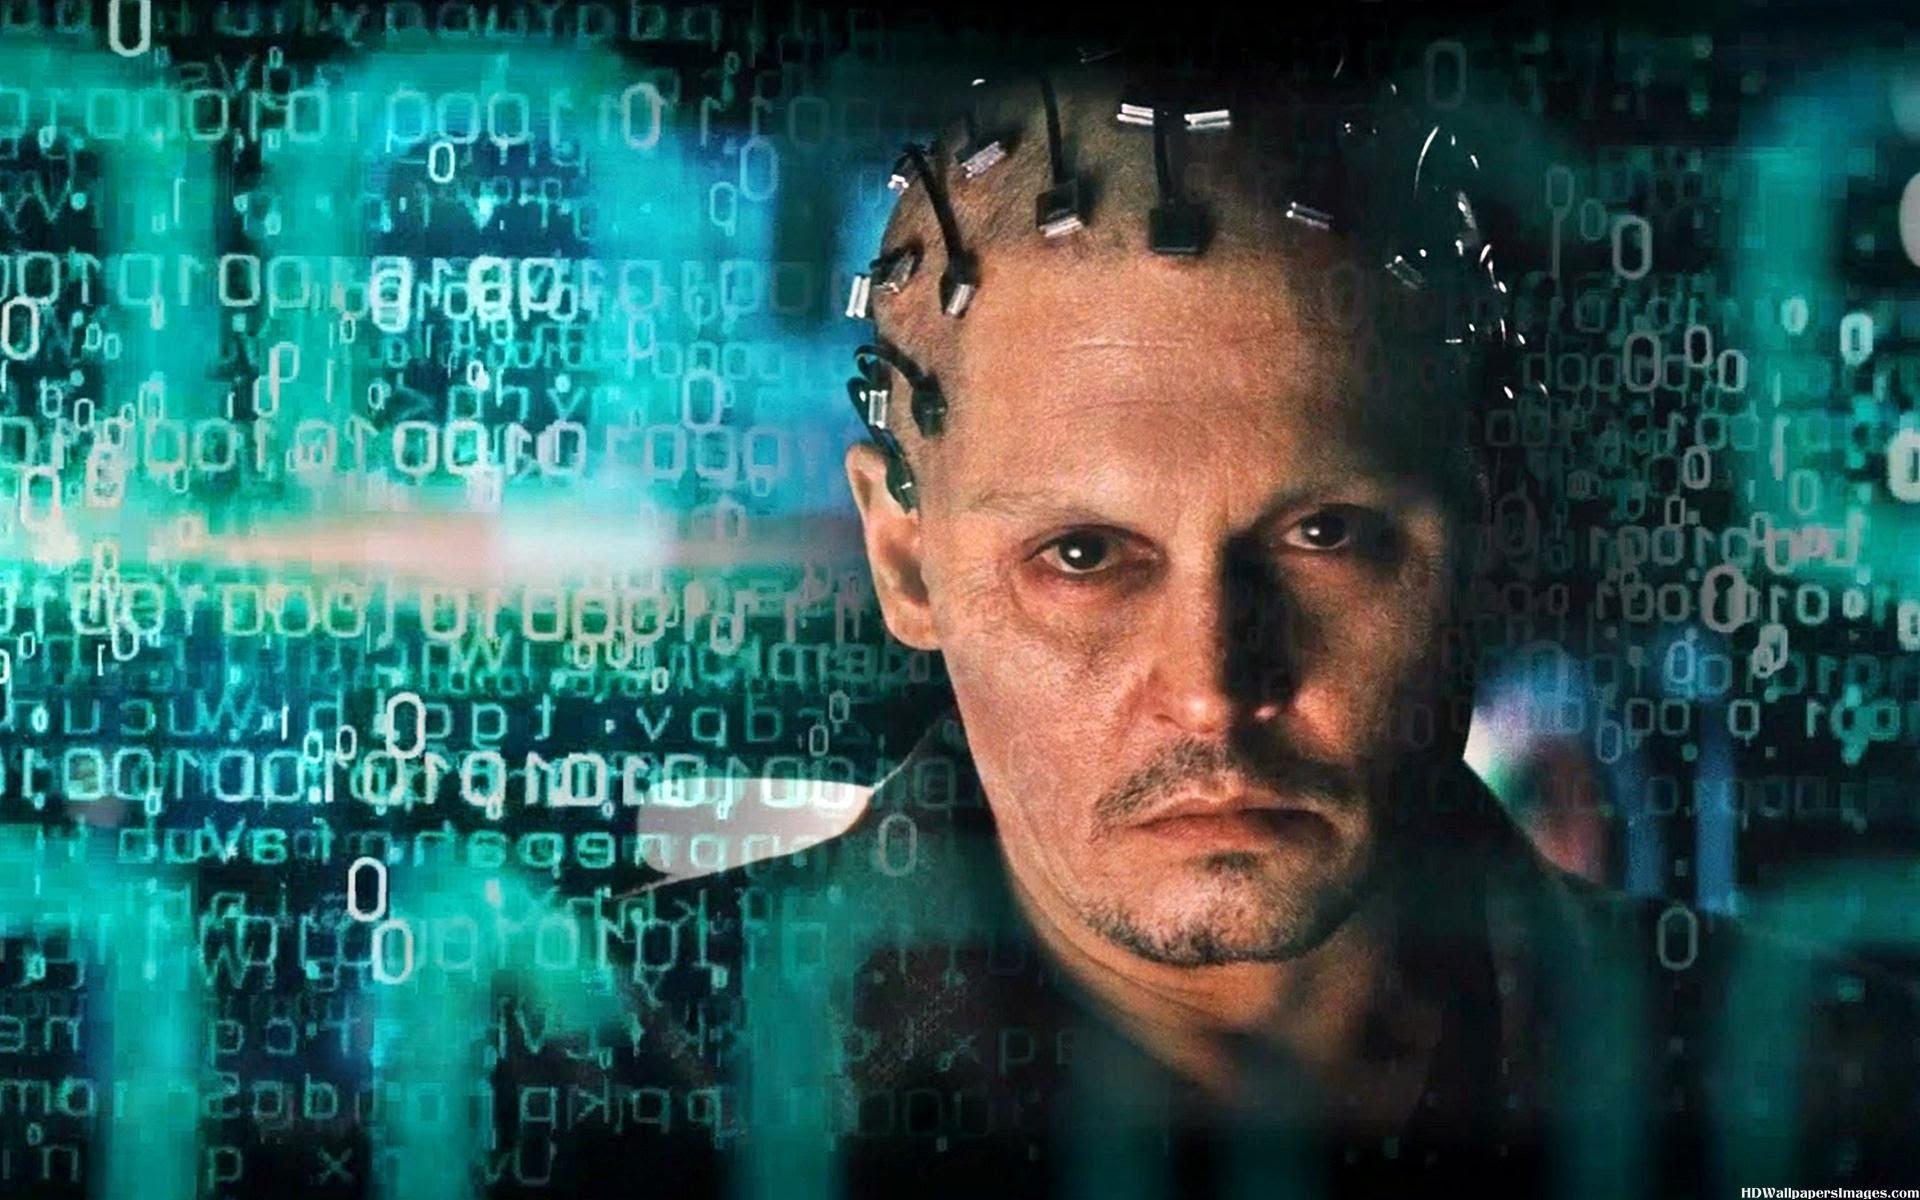 Transhumanism as entertainment